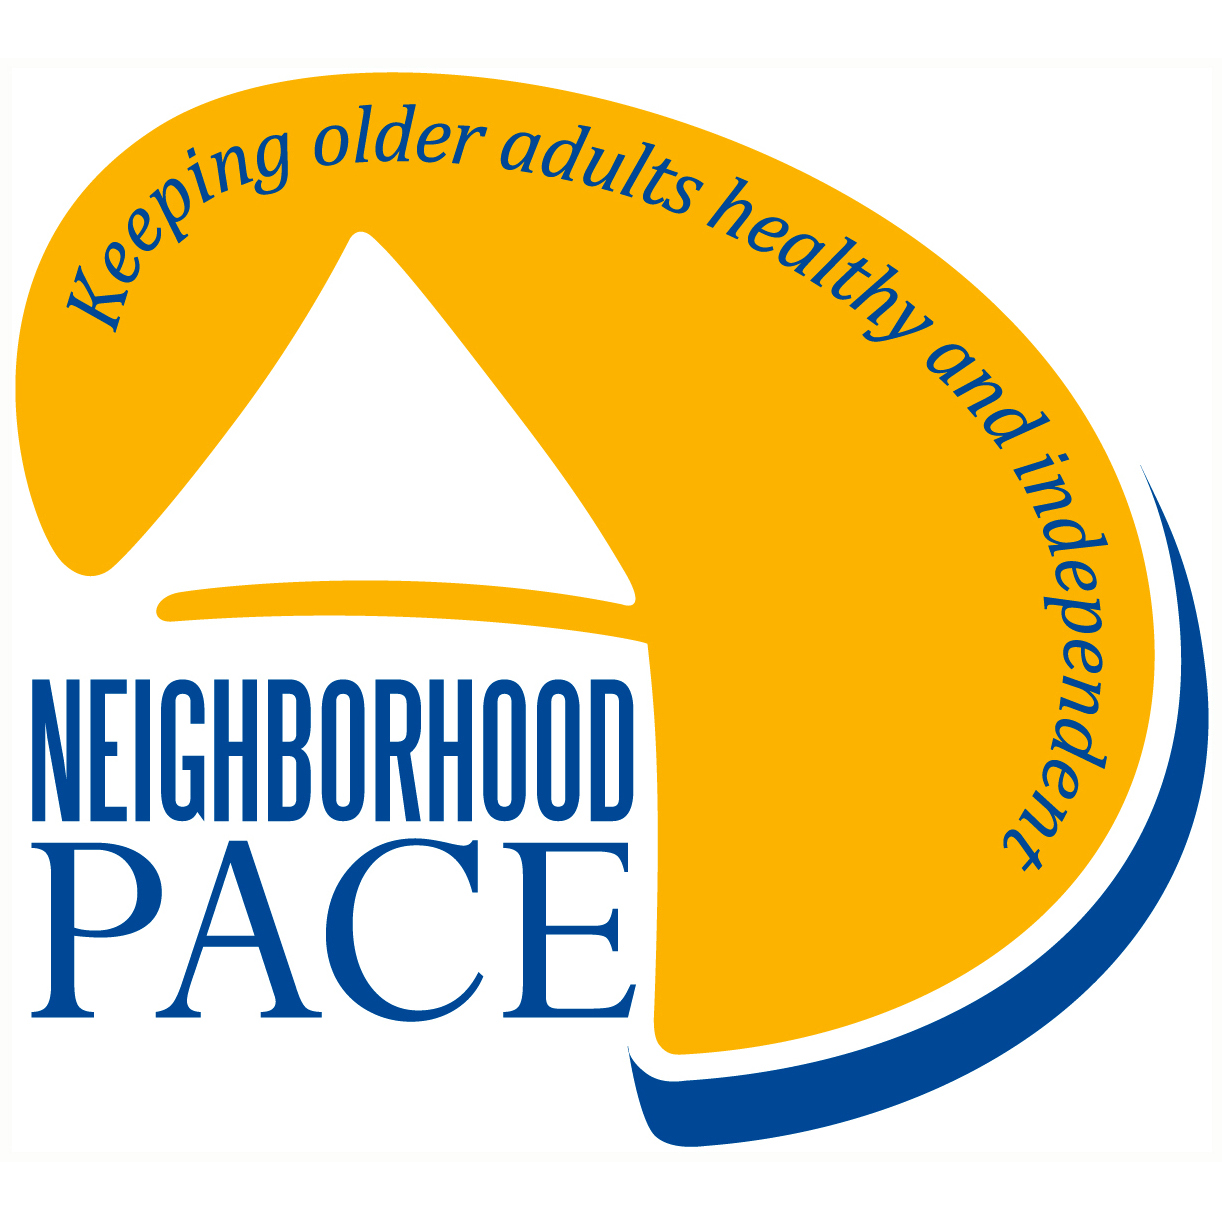 EBNHC'S Elder Service Plan Becomes Neighborhood PACE: New Revere